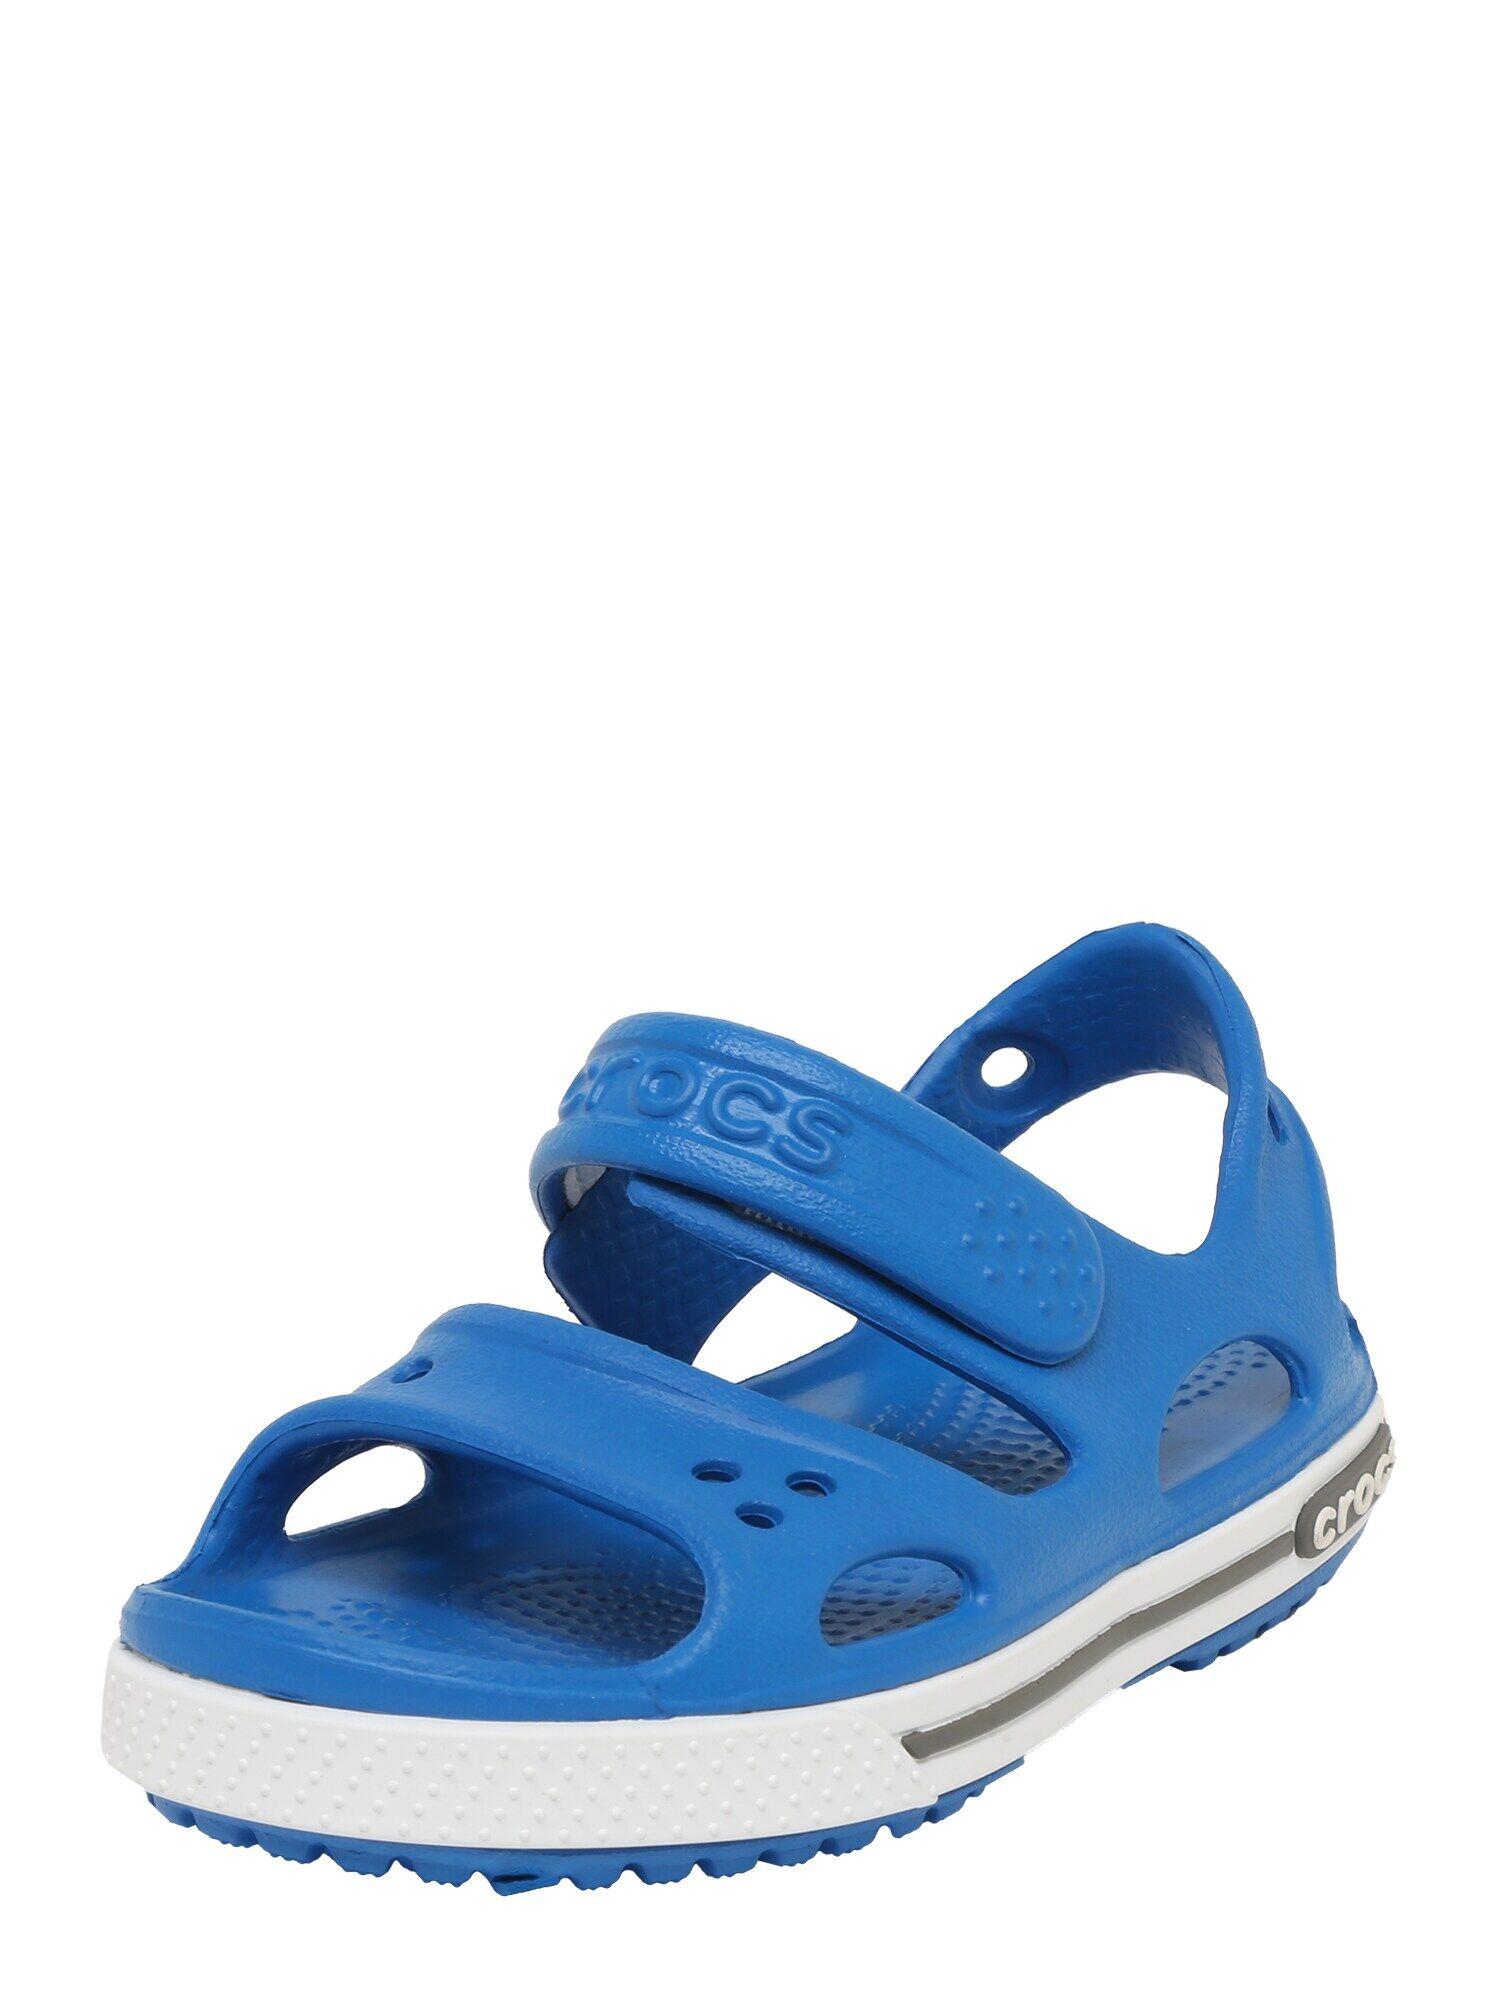 Crocs Chaussures ouvertes 'Crocband II'  - Bleu - Taille: 23.5 - boy